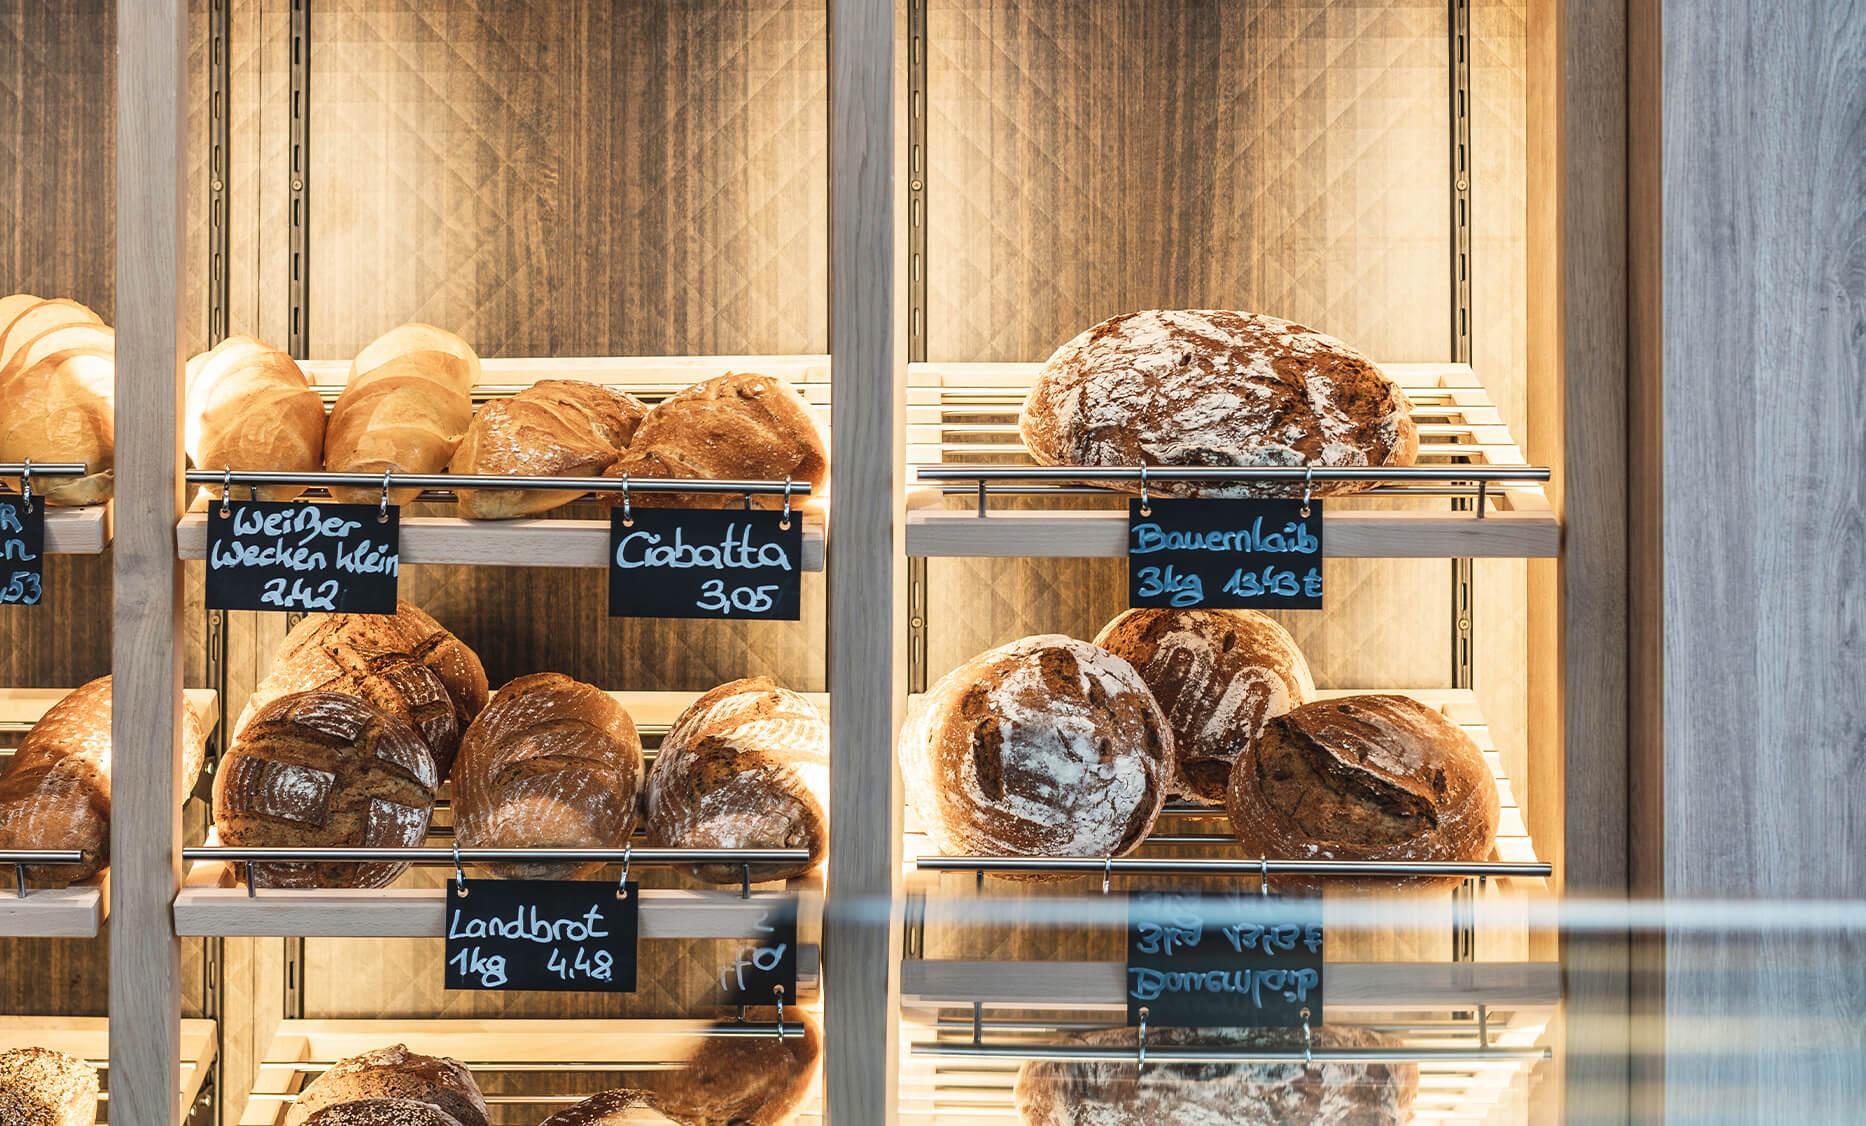 Bäckerei Fenzl - Filiale Oed